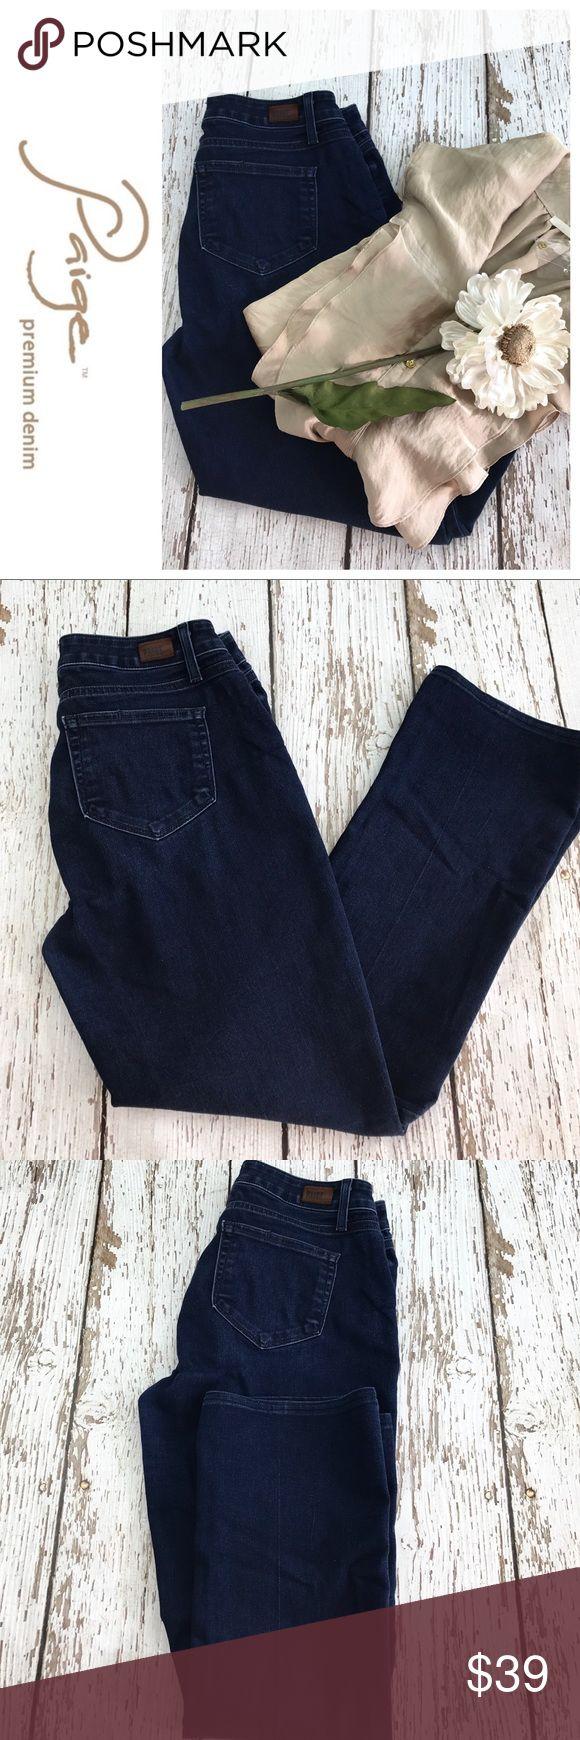 "💕SALE💕Paige Manhattan Premium Denim Jeans Fabulous 💕Paige Manhattan Premium Denim Jeans 29"" Inseam PAIGE Jeans"